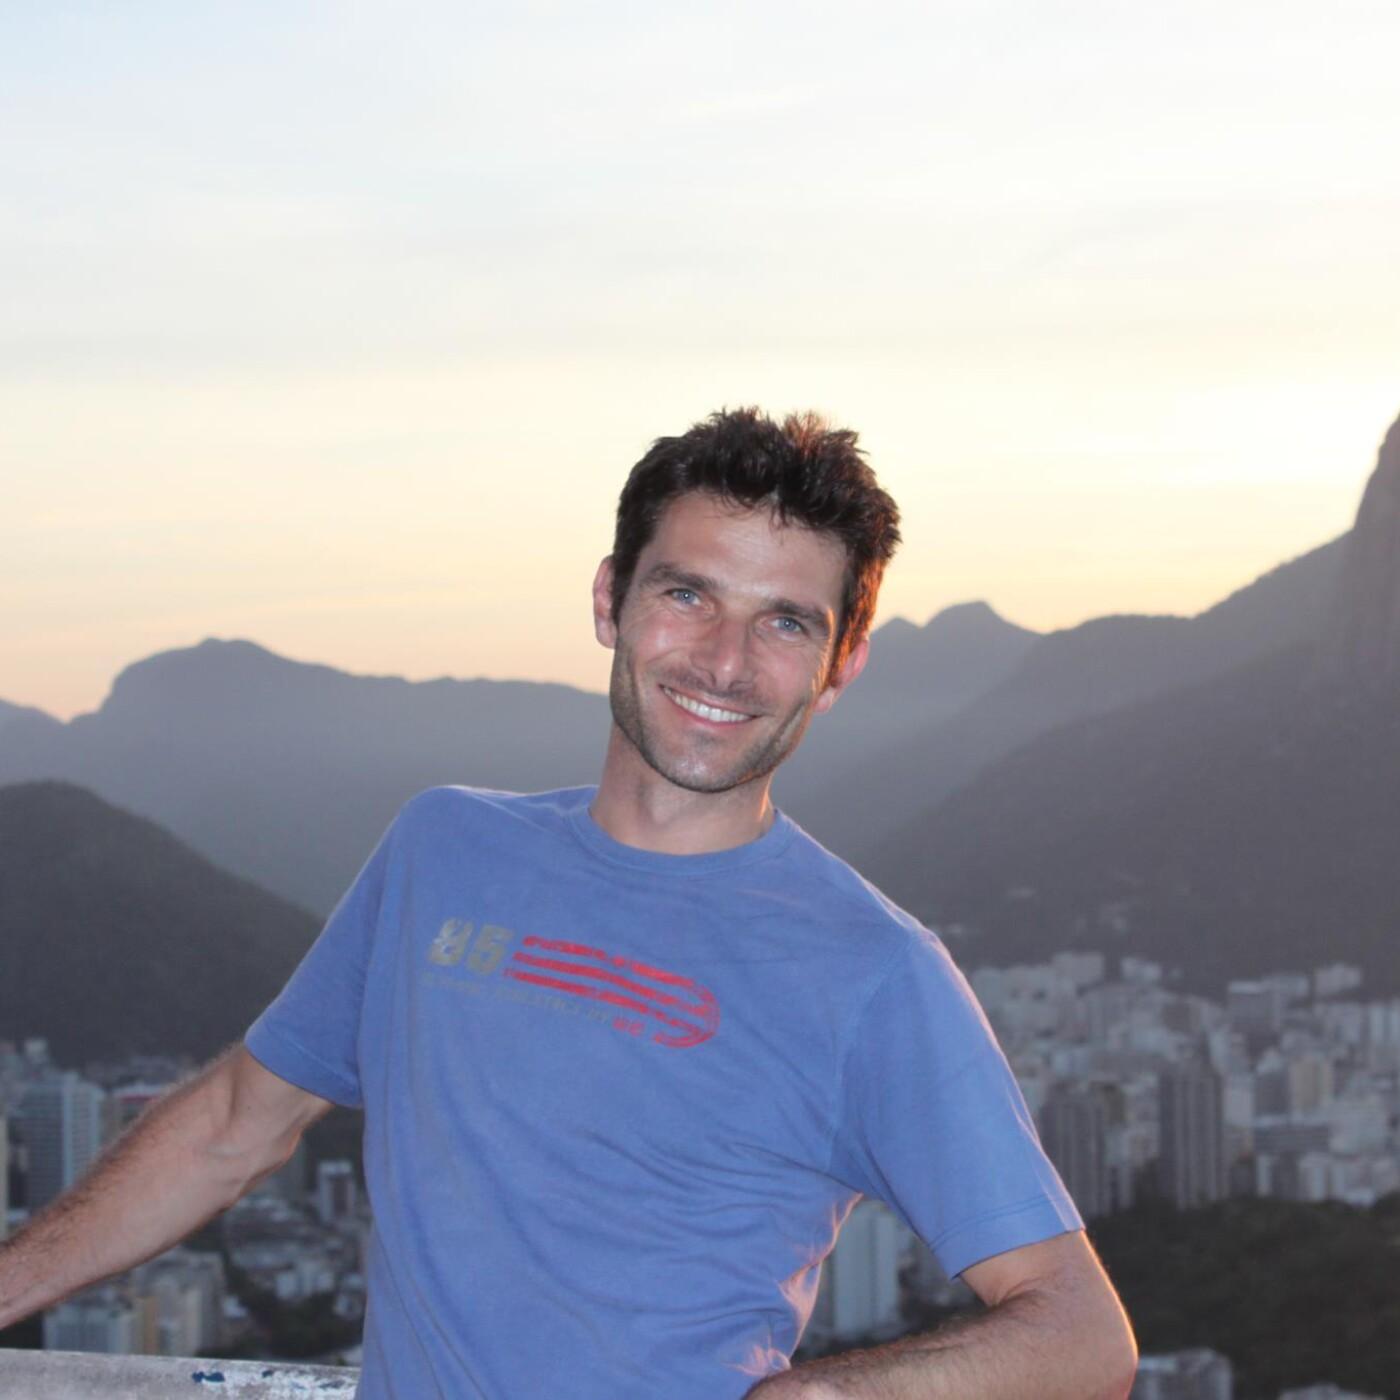 David, correspondant a Rio de Janeiro, Brésil, parle de la situation sanitaire - 09 04 2021 - StereoChic Radio